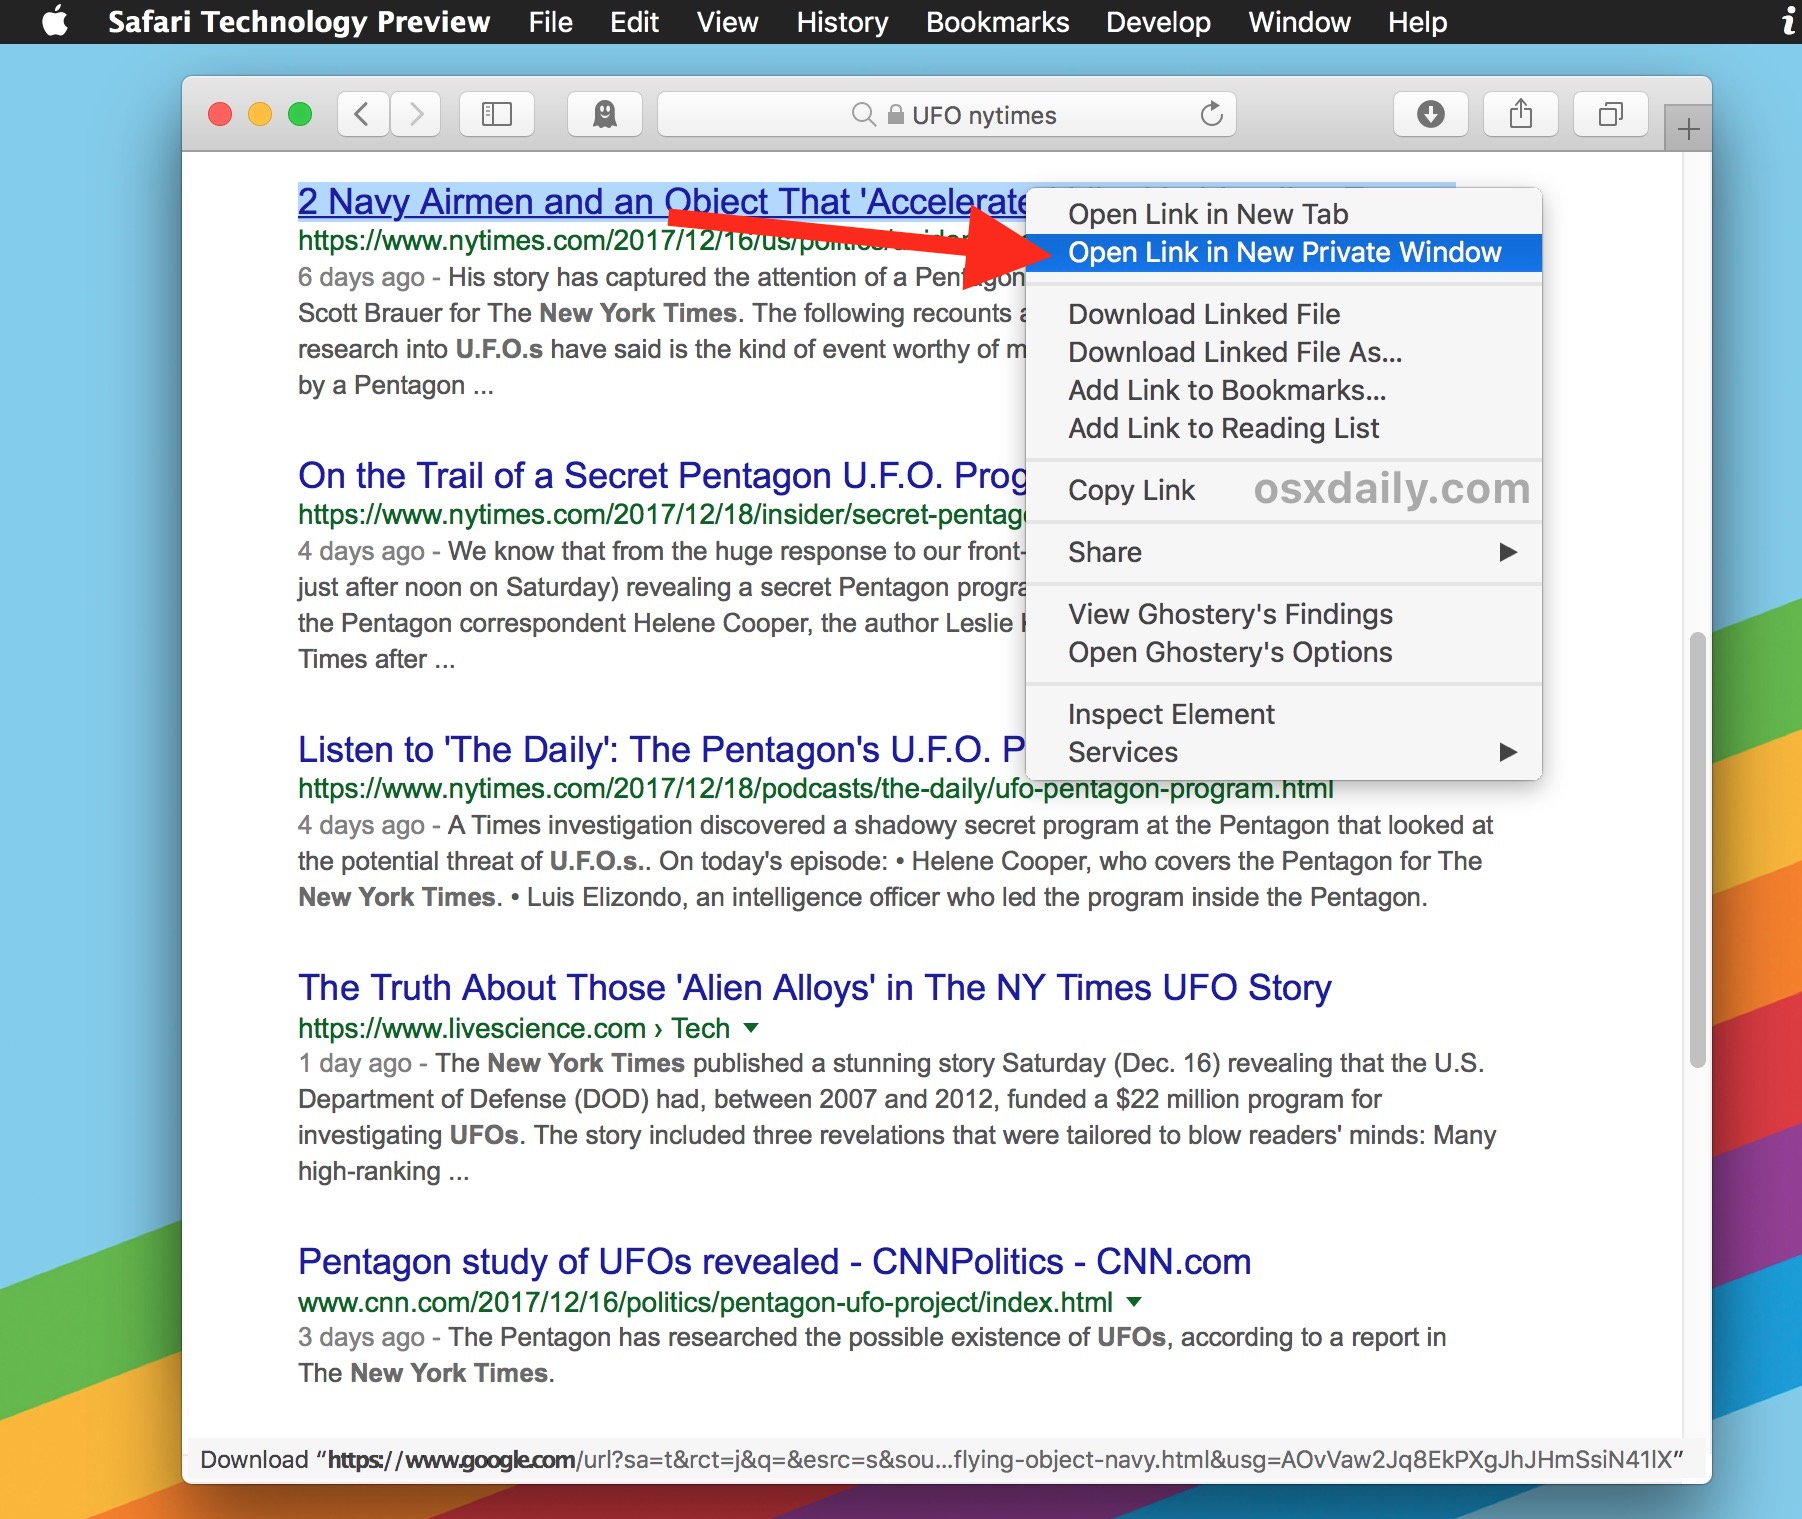 Choose open link in new private window in Safari for Mac